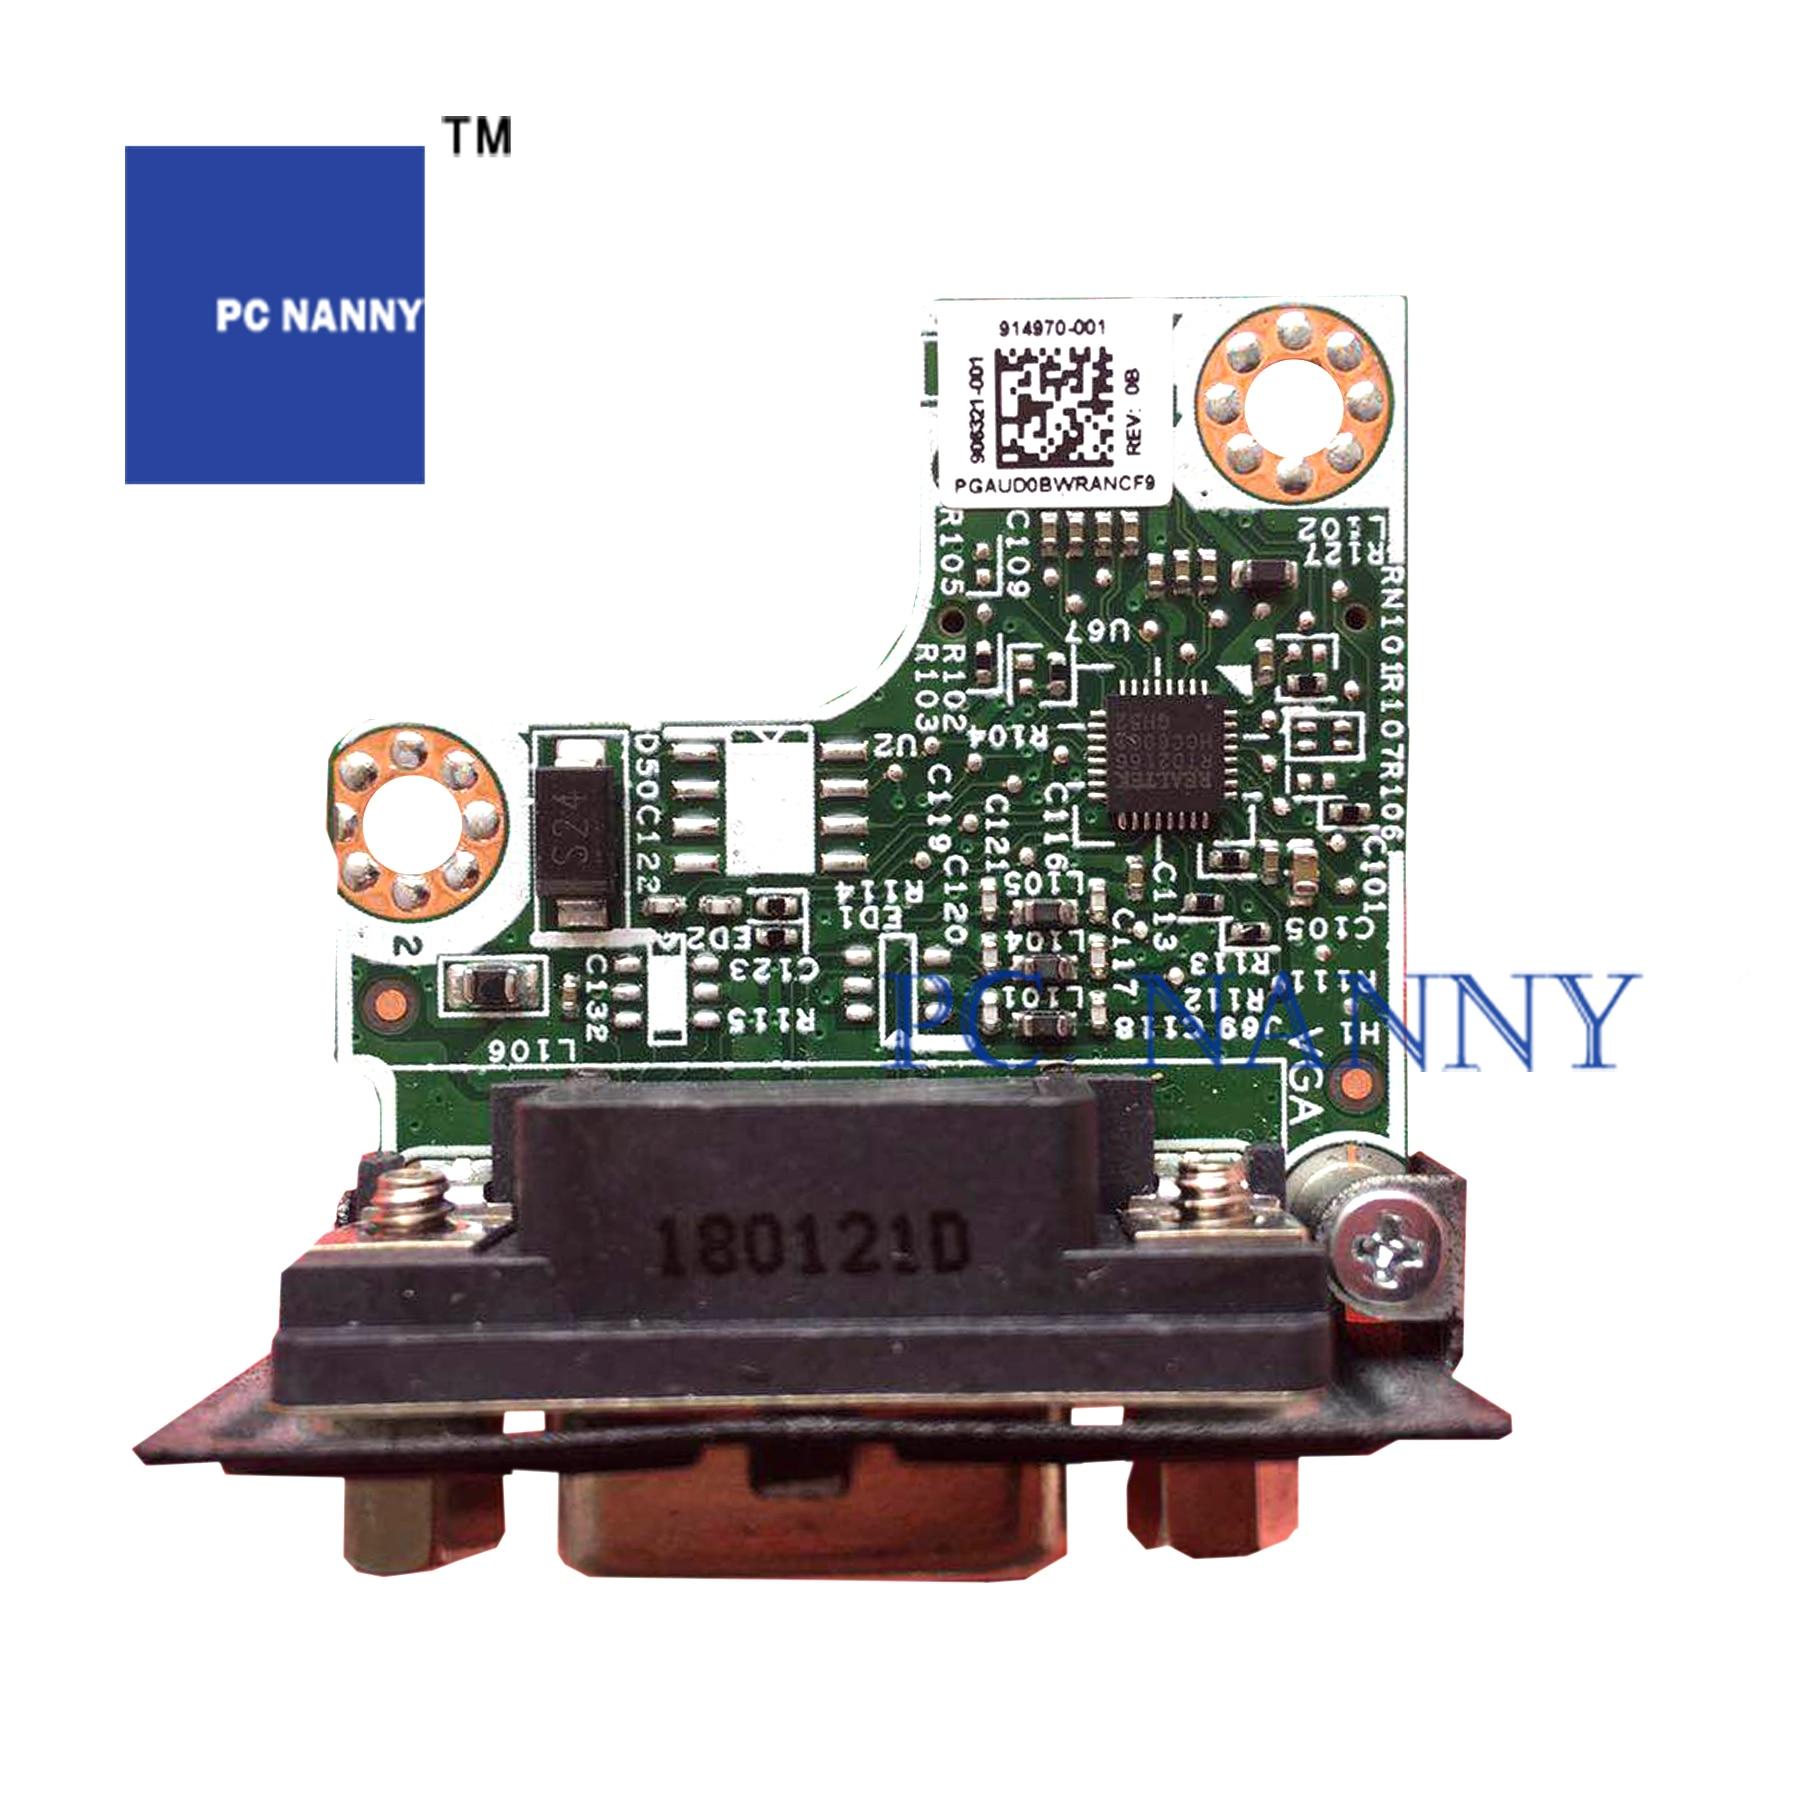 Pcnلسيارات HP ProDesk 600 G3 VGA ، لوحة خيار VOLANS 906321-001 hdd ، 350.06N04.0011